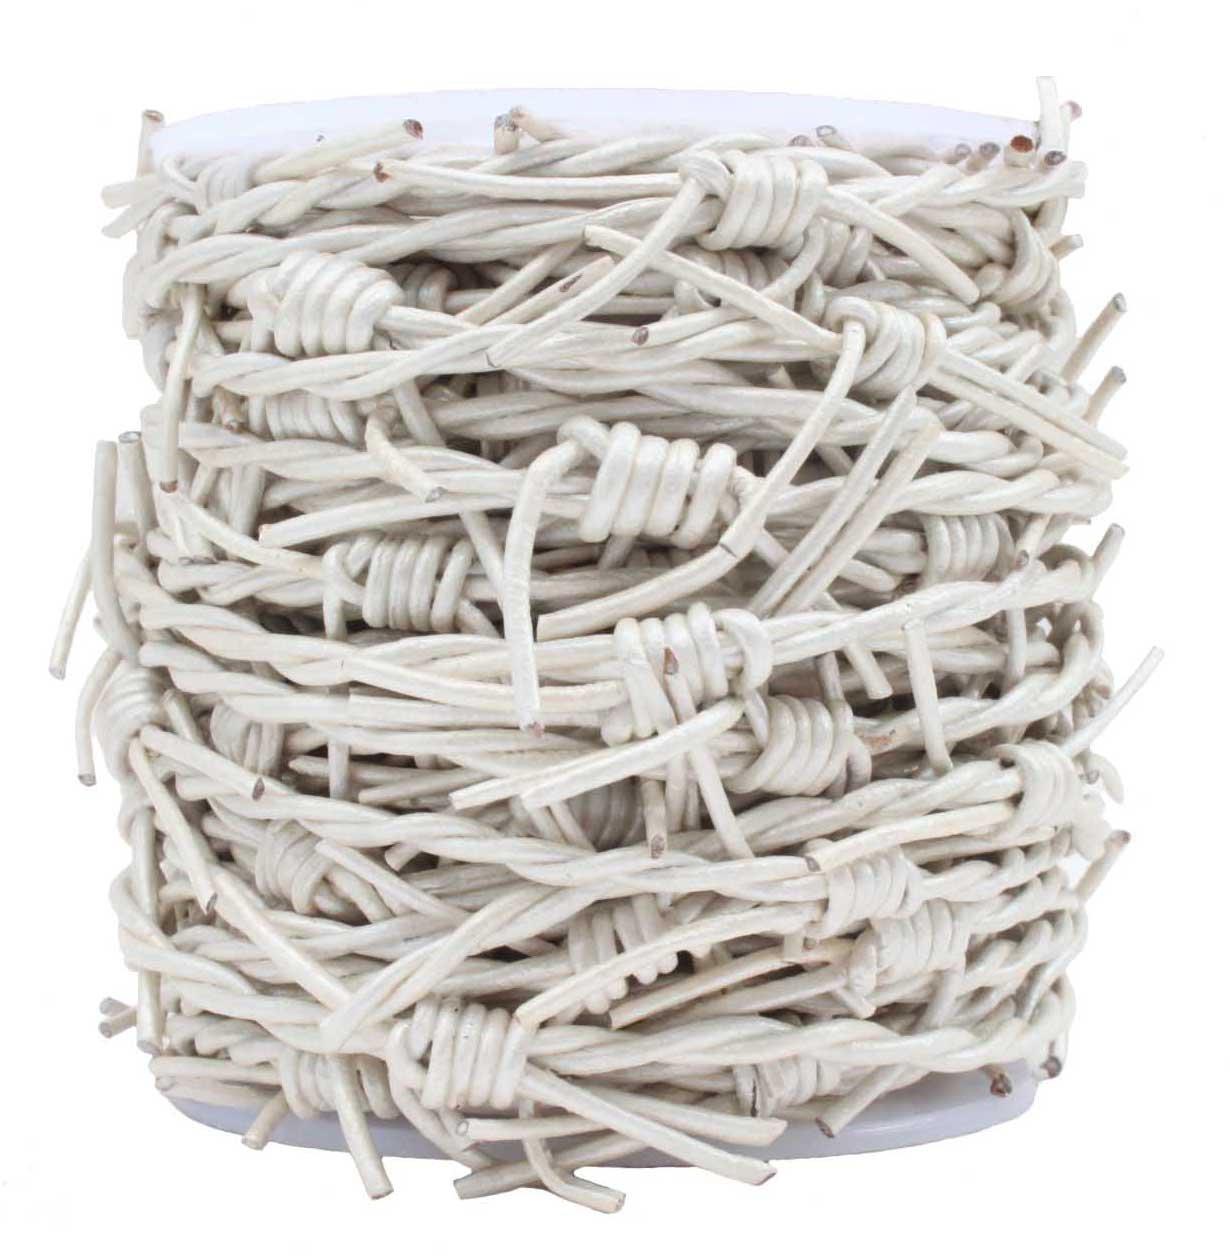 Amazon.com: Leather Cord Barbed Wire, 10 Meter Spool, Black: Arts ...